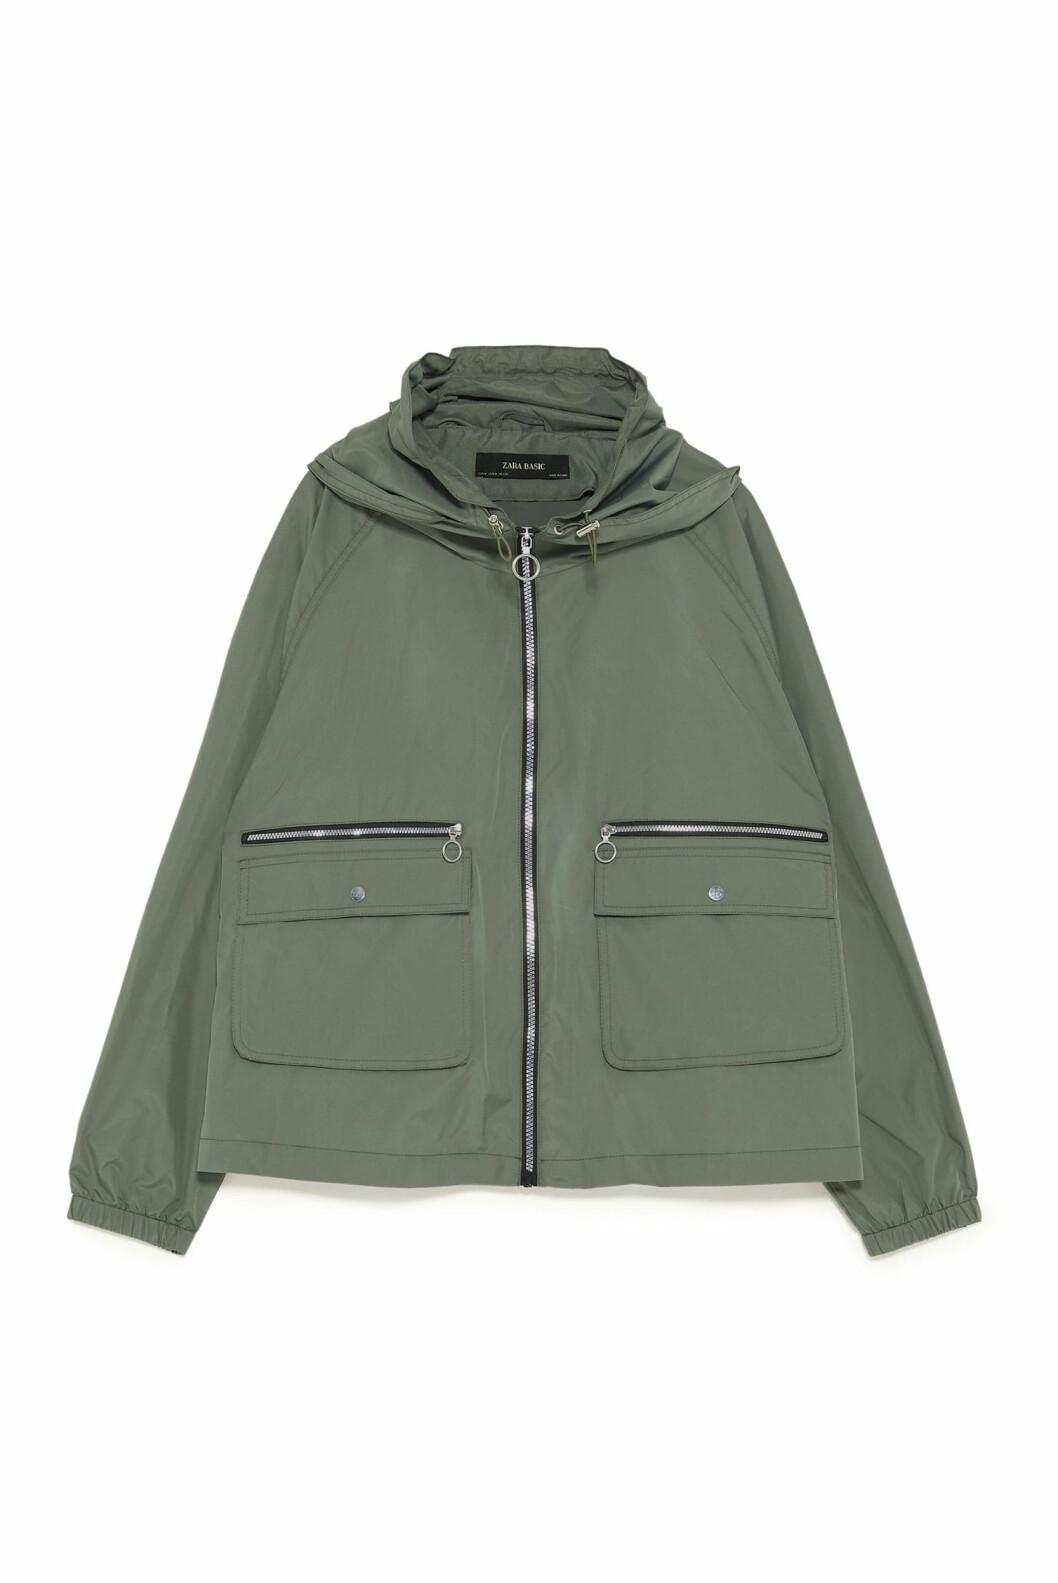 Zara, kr 350